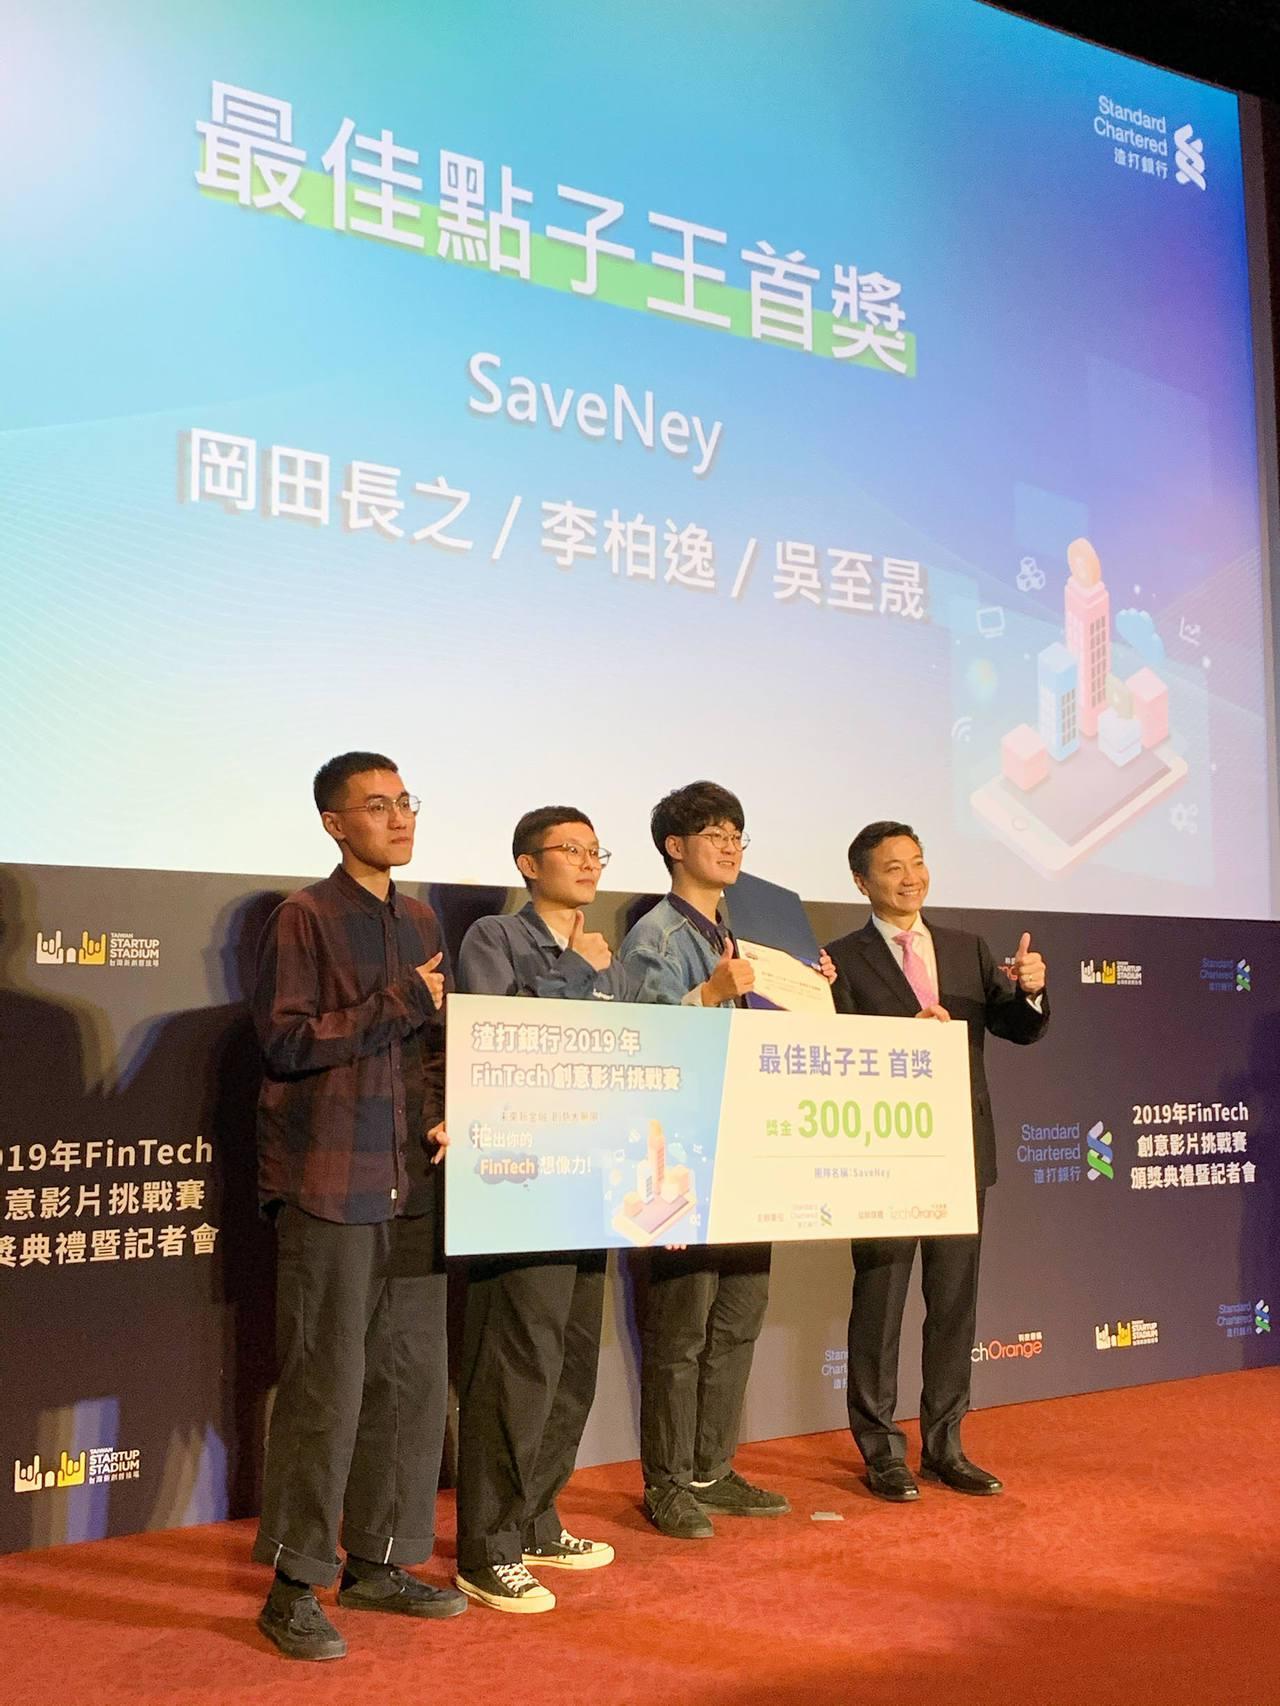 SaveNey奪下「最佳點子王首獎」,獲得30萬元獎金。記者徐力剛/攝影